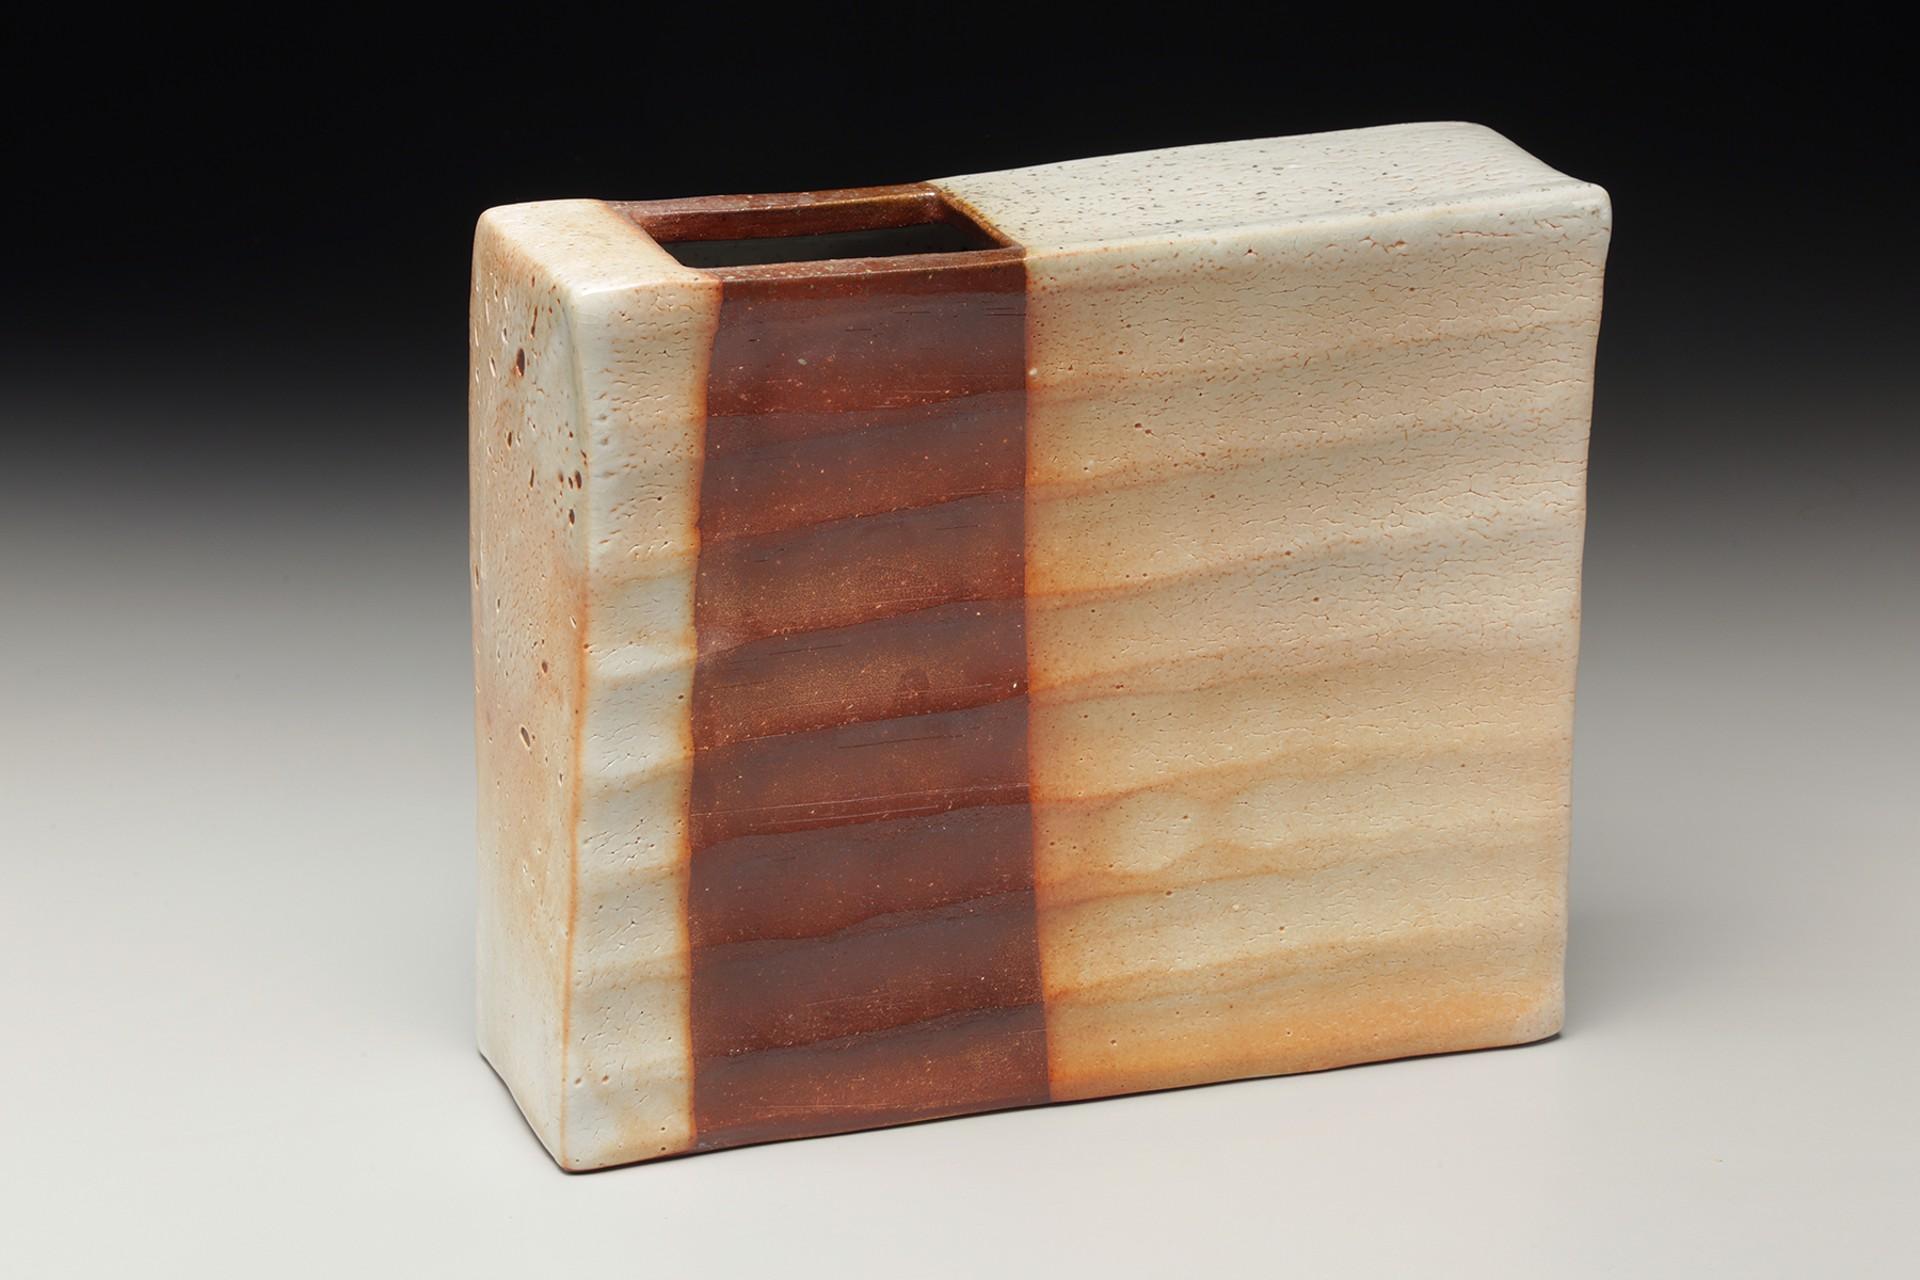 Asymmetrical Vase Dry Shino by Nancy Green